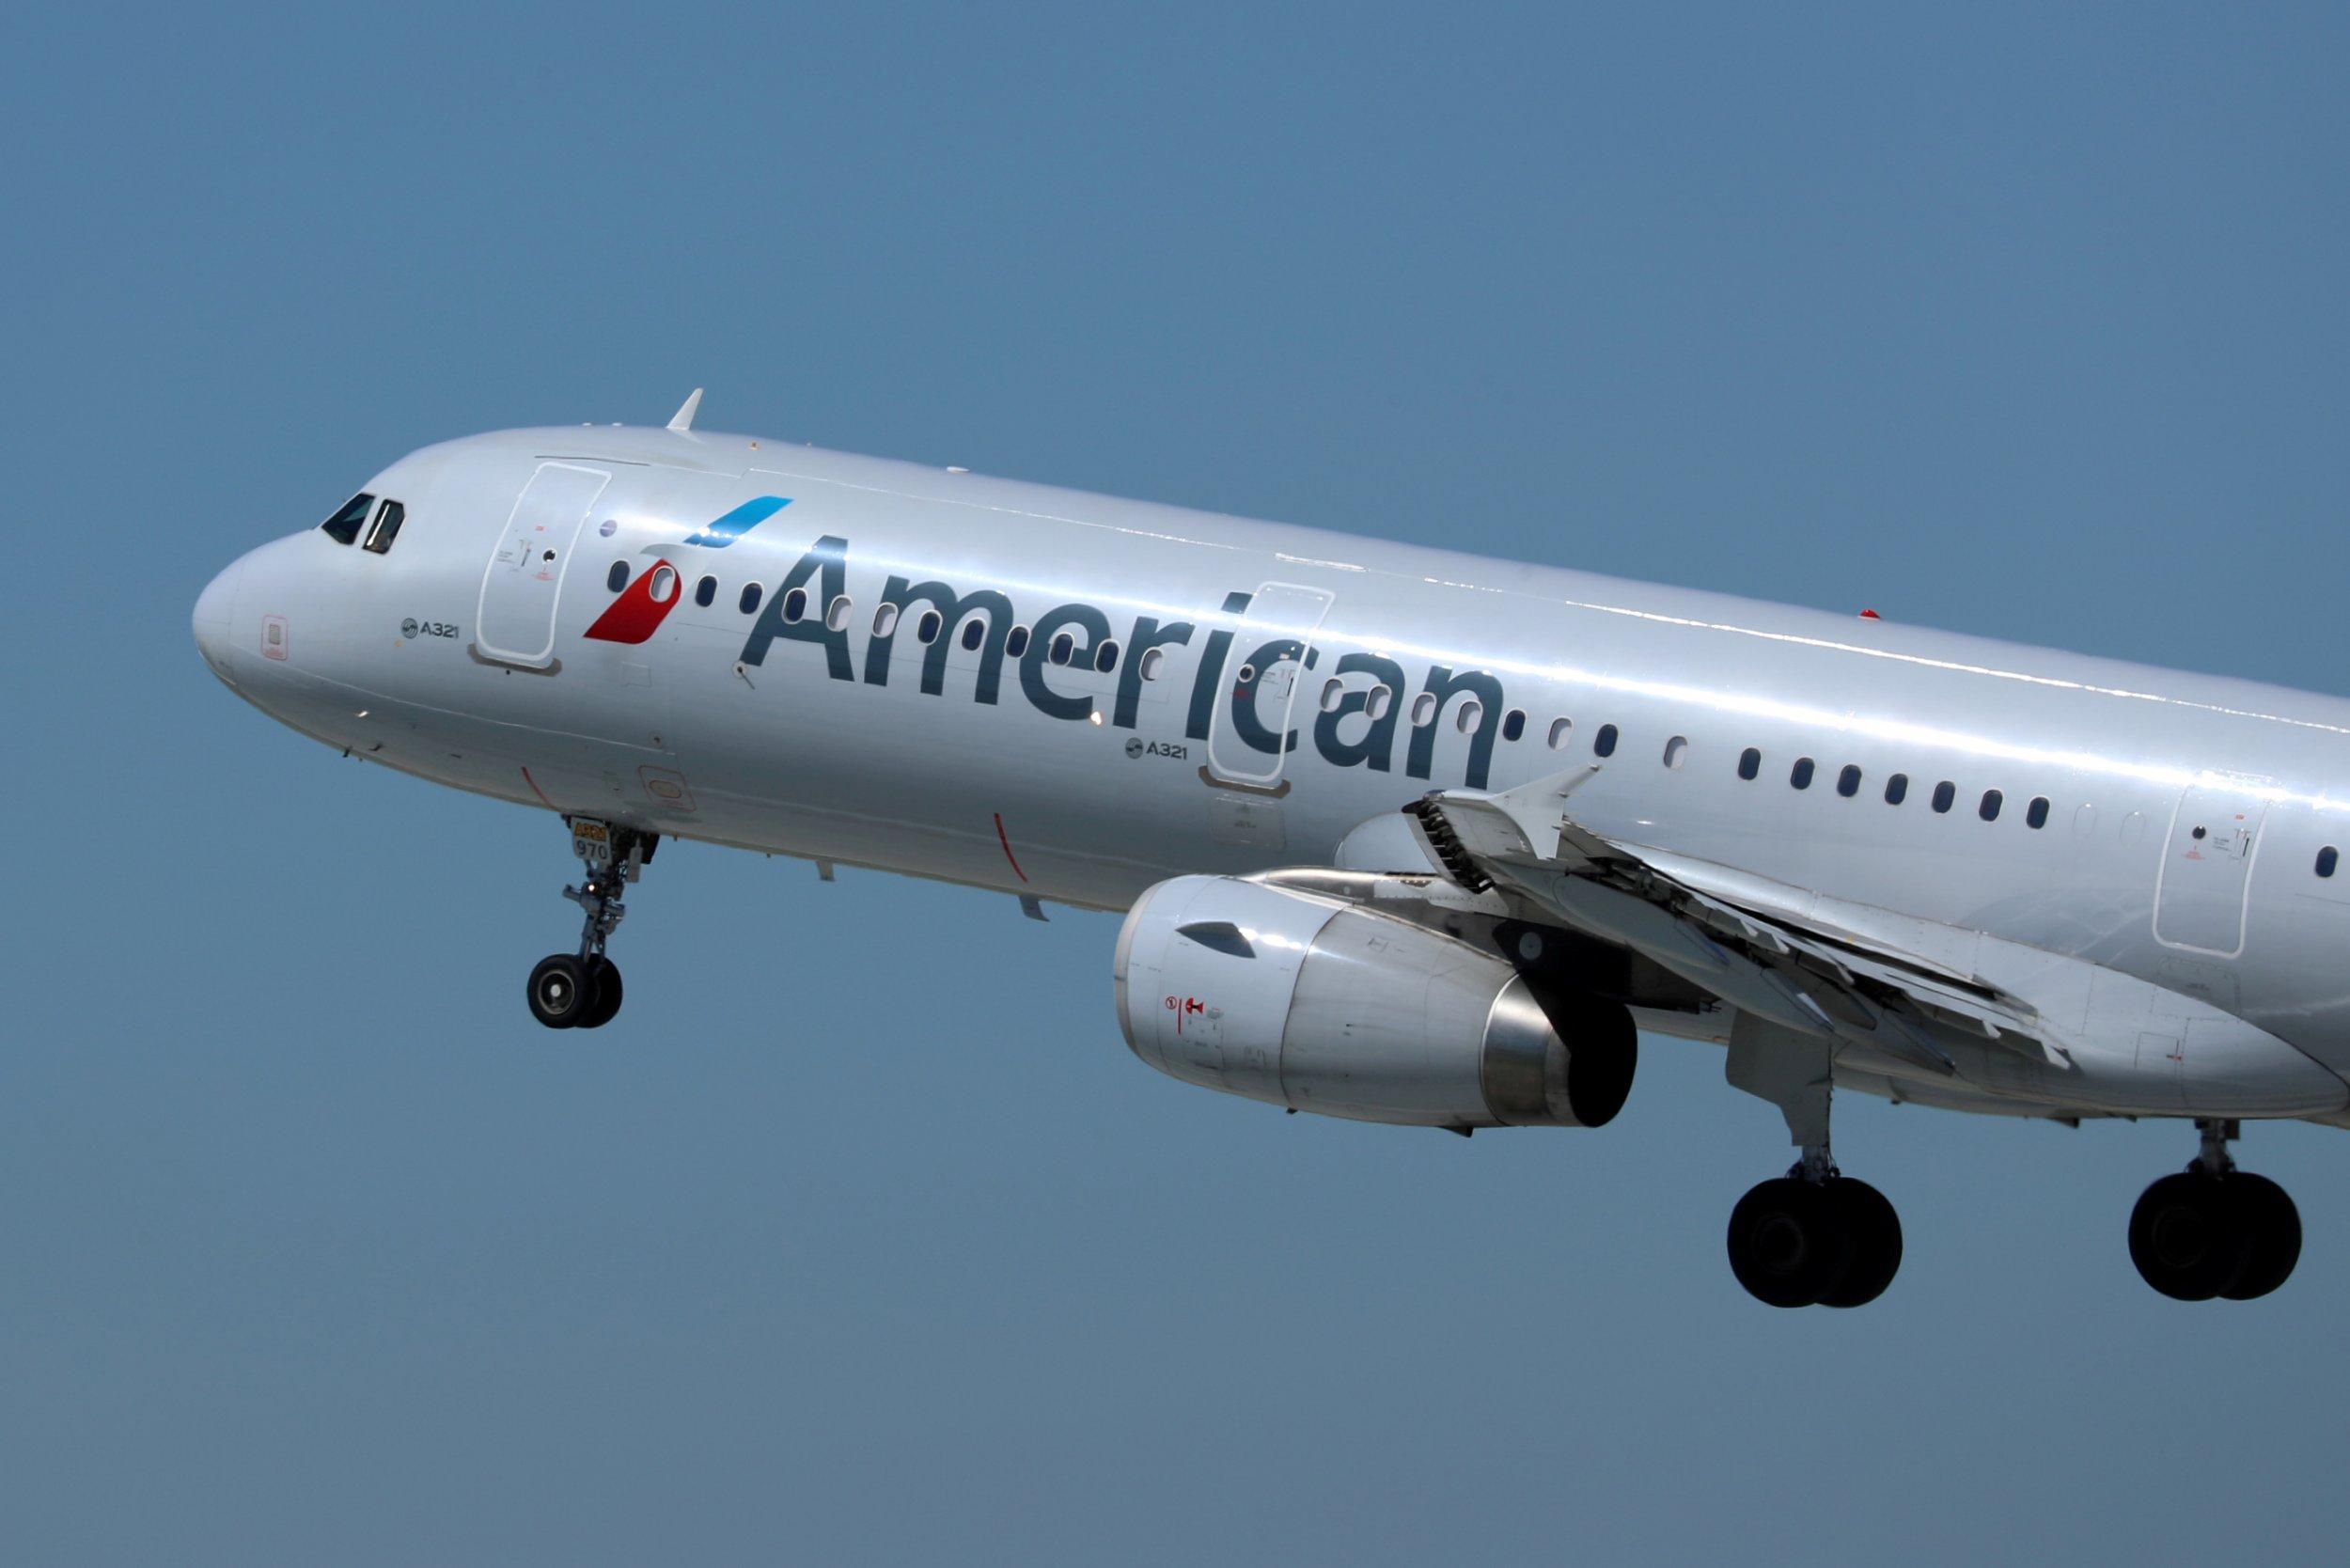 2018-06-03T080839Z_1931665666_RC1E82686220_RTRMADP_3_AIRLINES-IATA-AMERICAN-AIRLINE